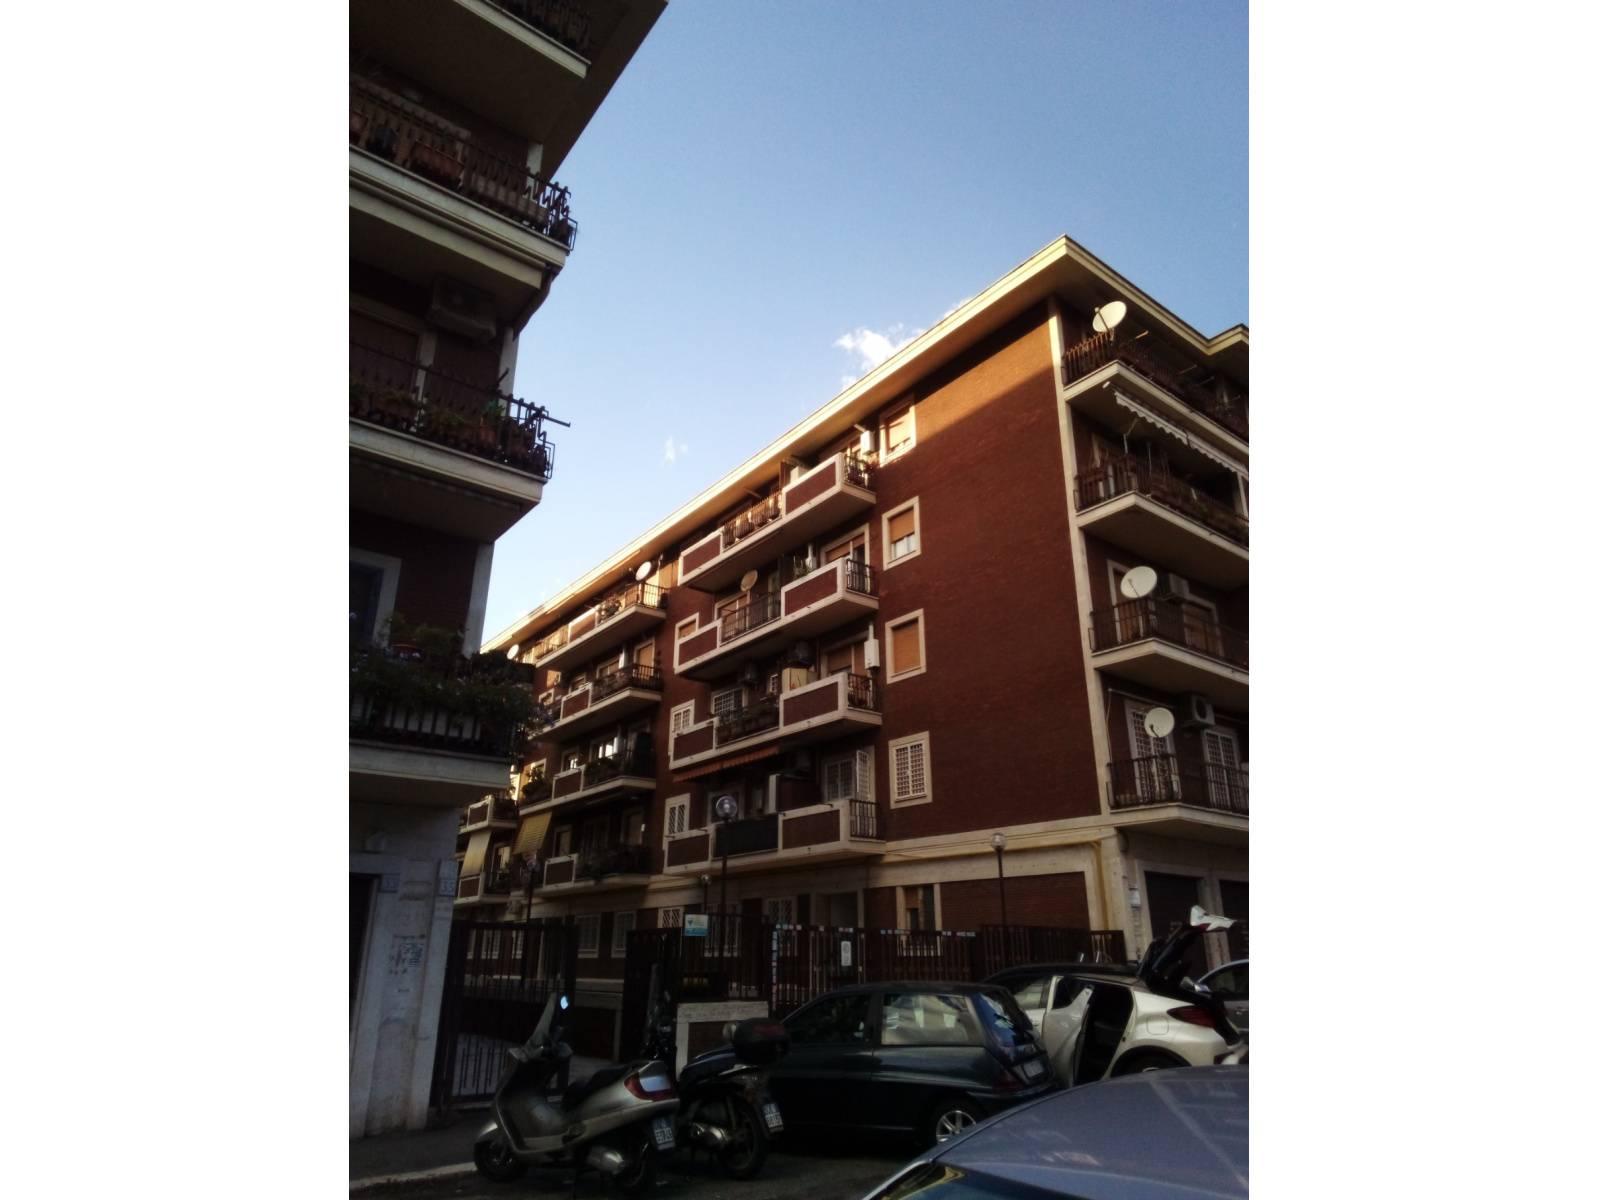 1118419374 Trilocale in Via Beniamino Costantini, Roma, Zona Tor Pignattara